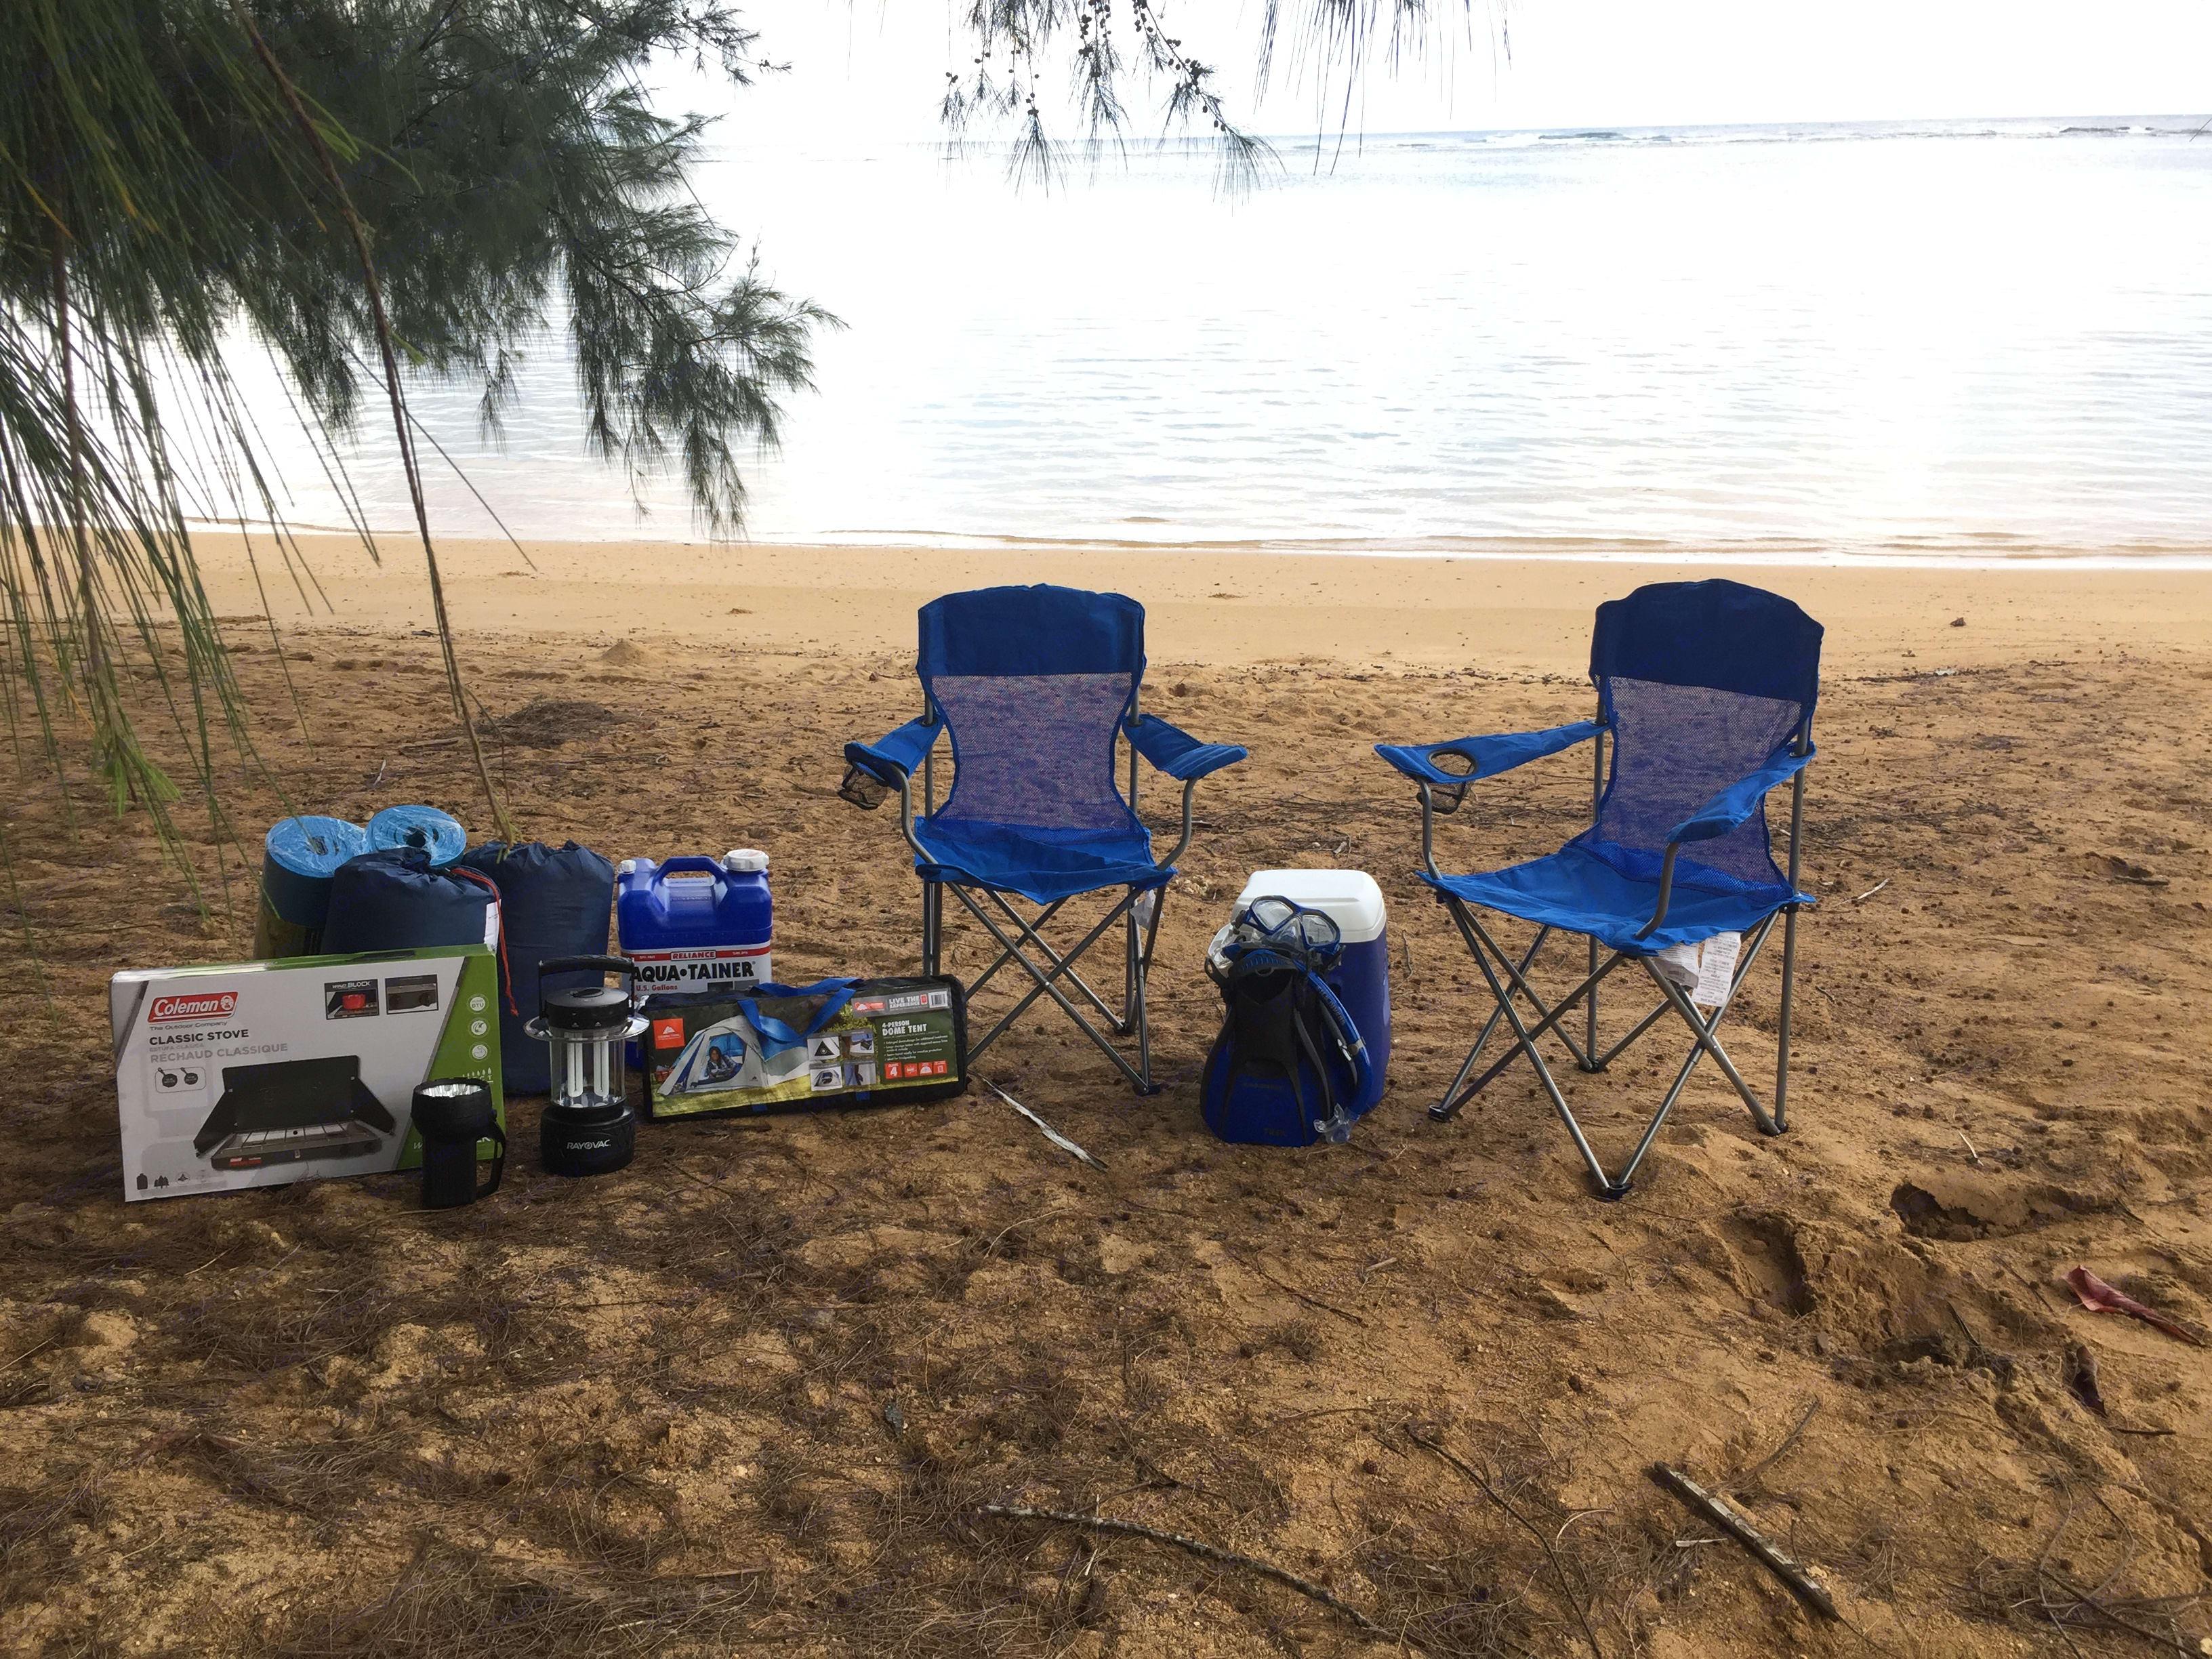 Beach & Camping Equipment.. Toyota Sequoia 2 Wheel Drive 2003